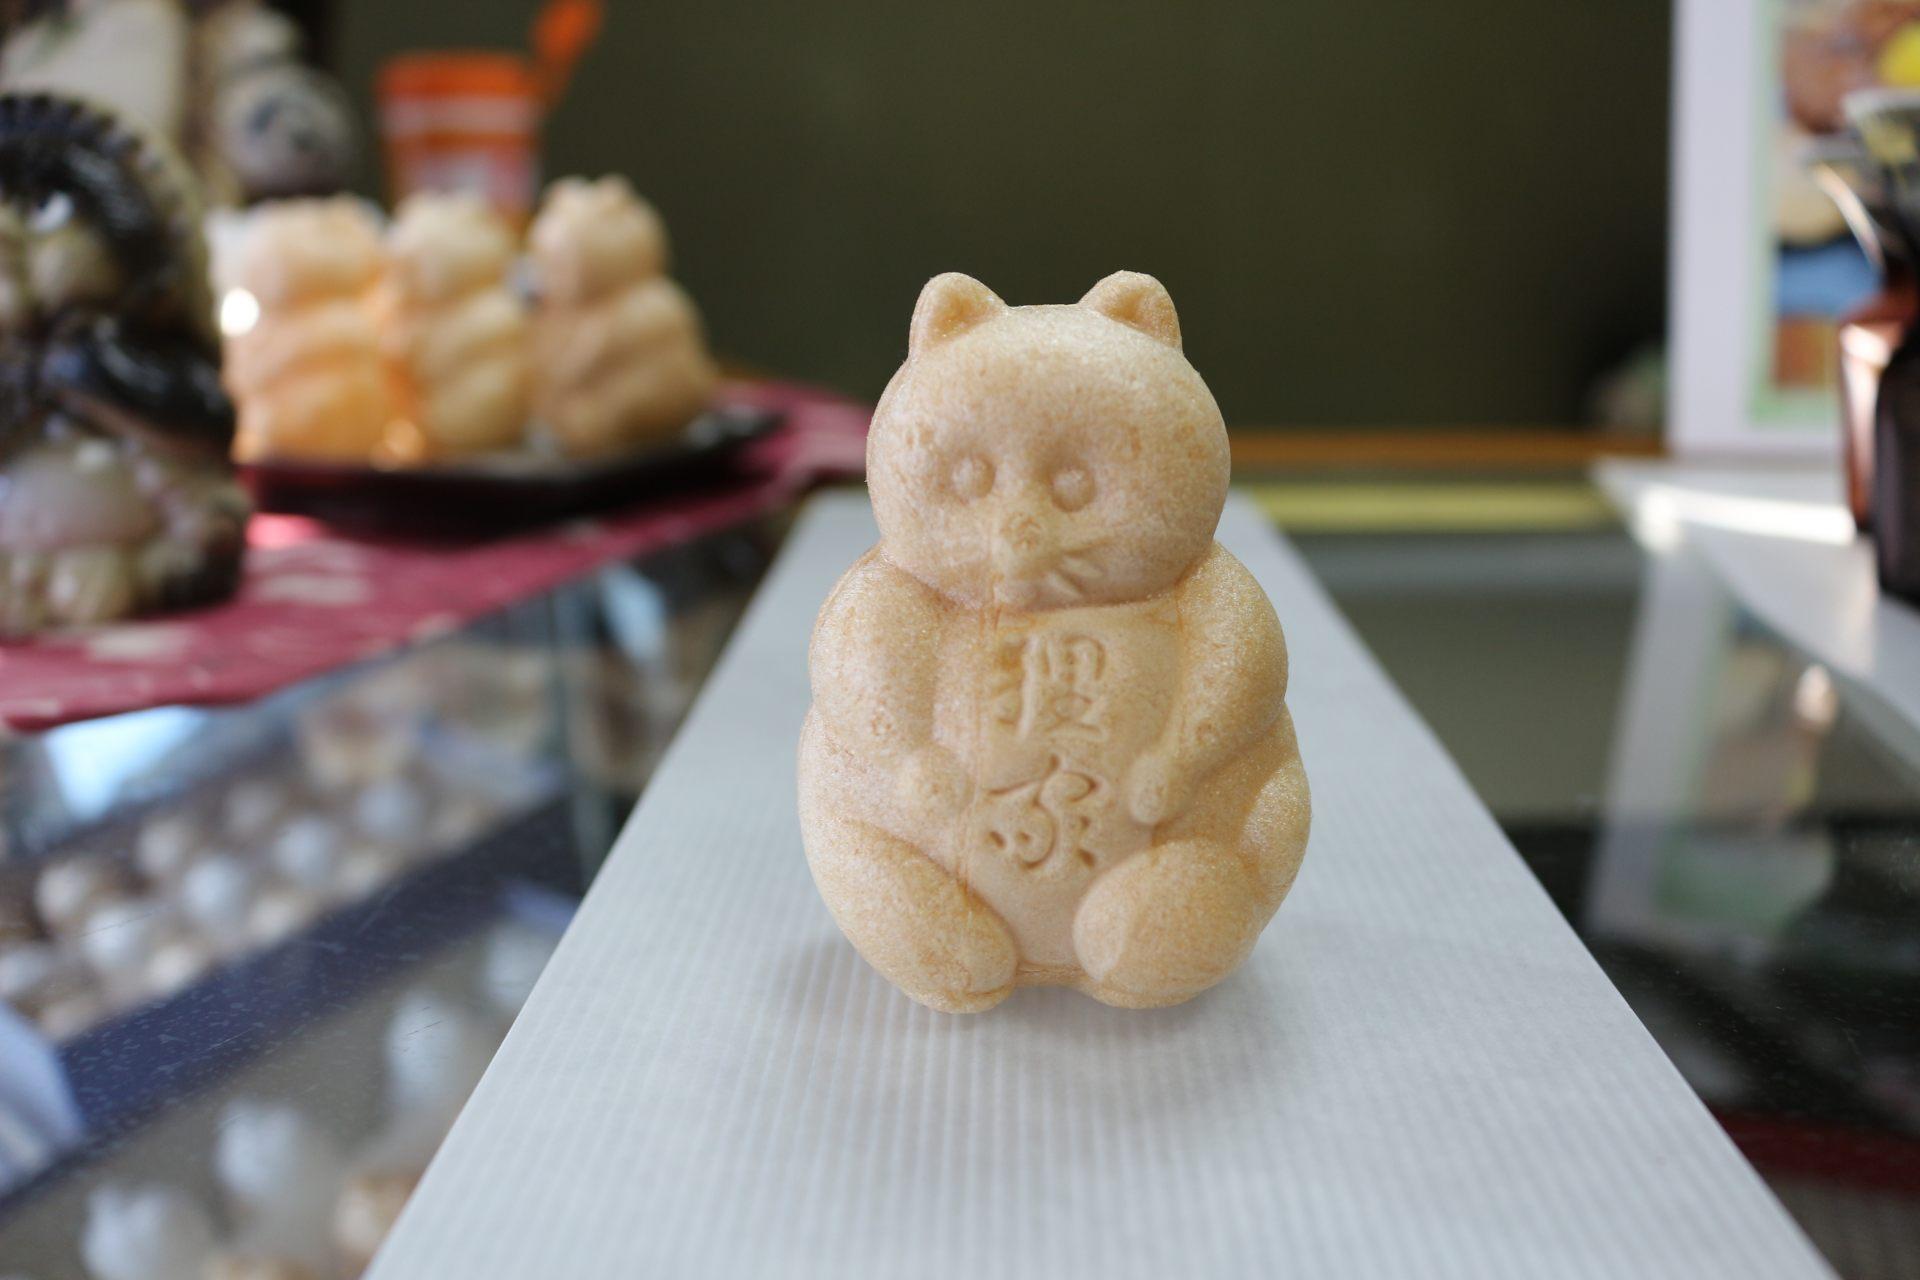 The Tanuki Monaka, with a delicious, crispy skin ¥120